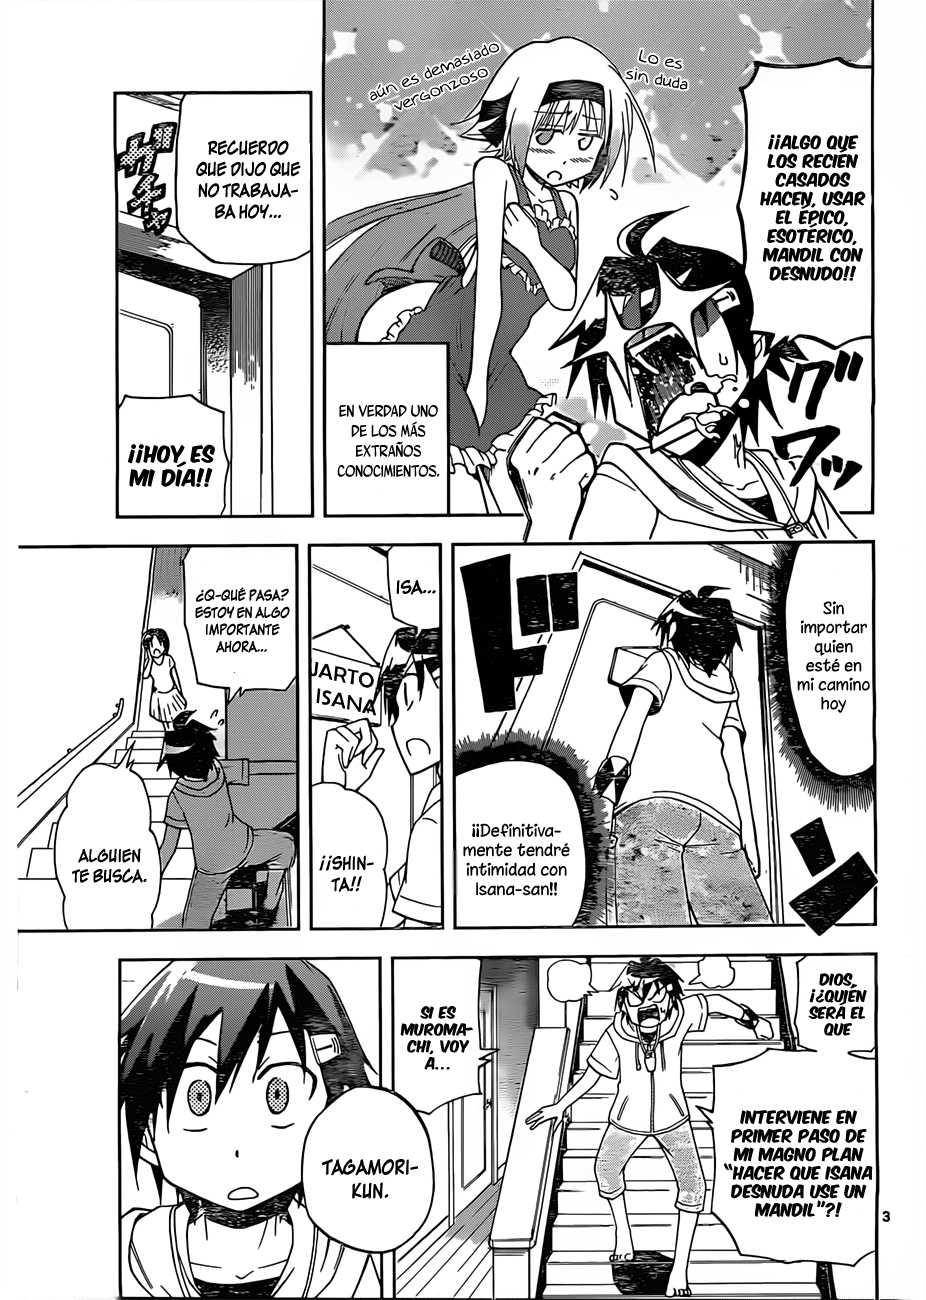 http://c5.ninemanga.com/es_manga/19/14419/356700/484862041befb1d3e8fada76b4f2e0d1.jpg Page 6